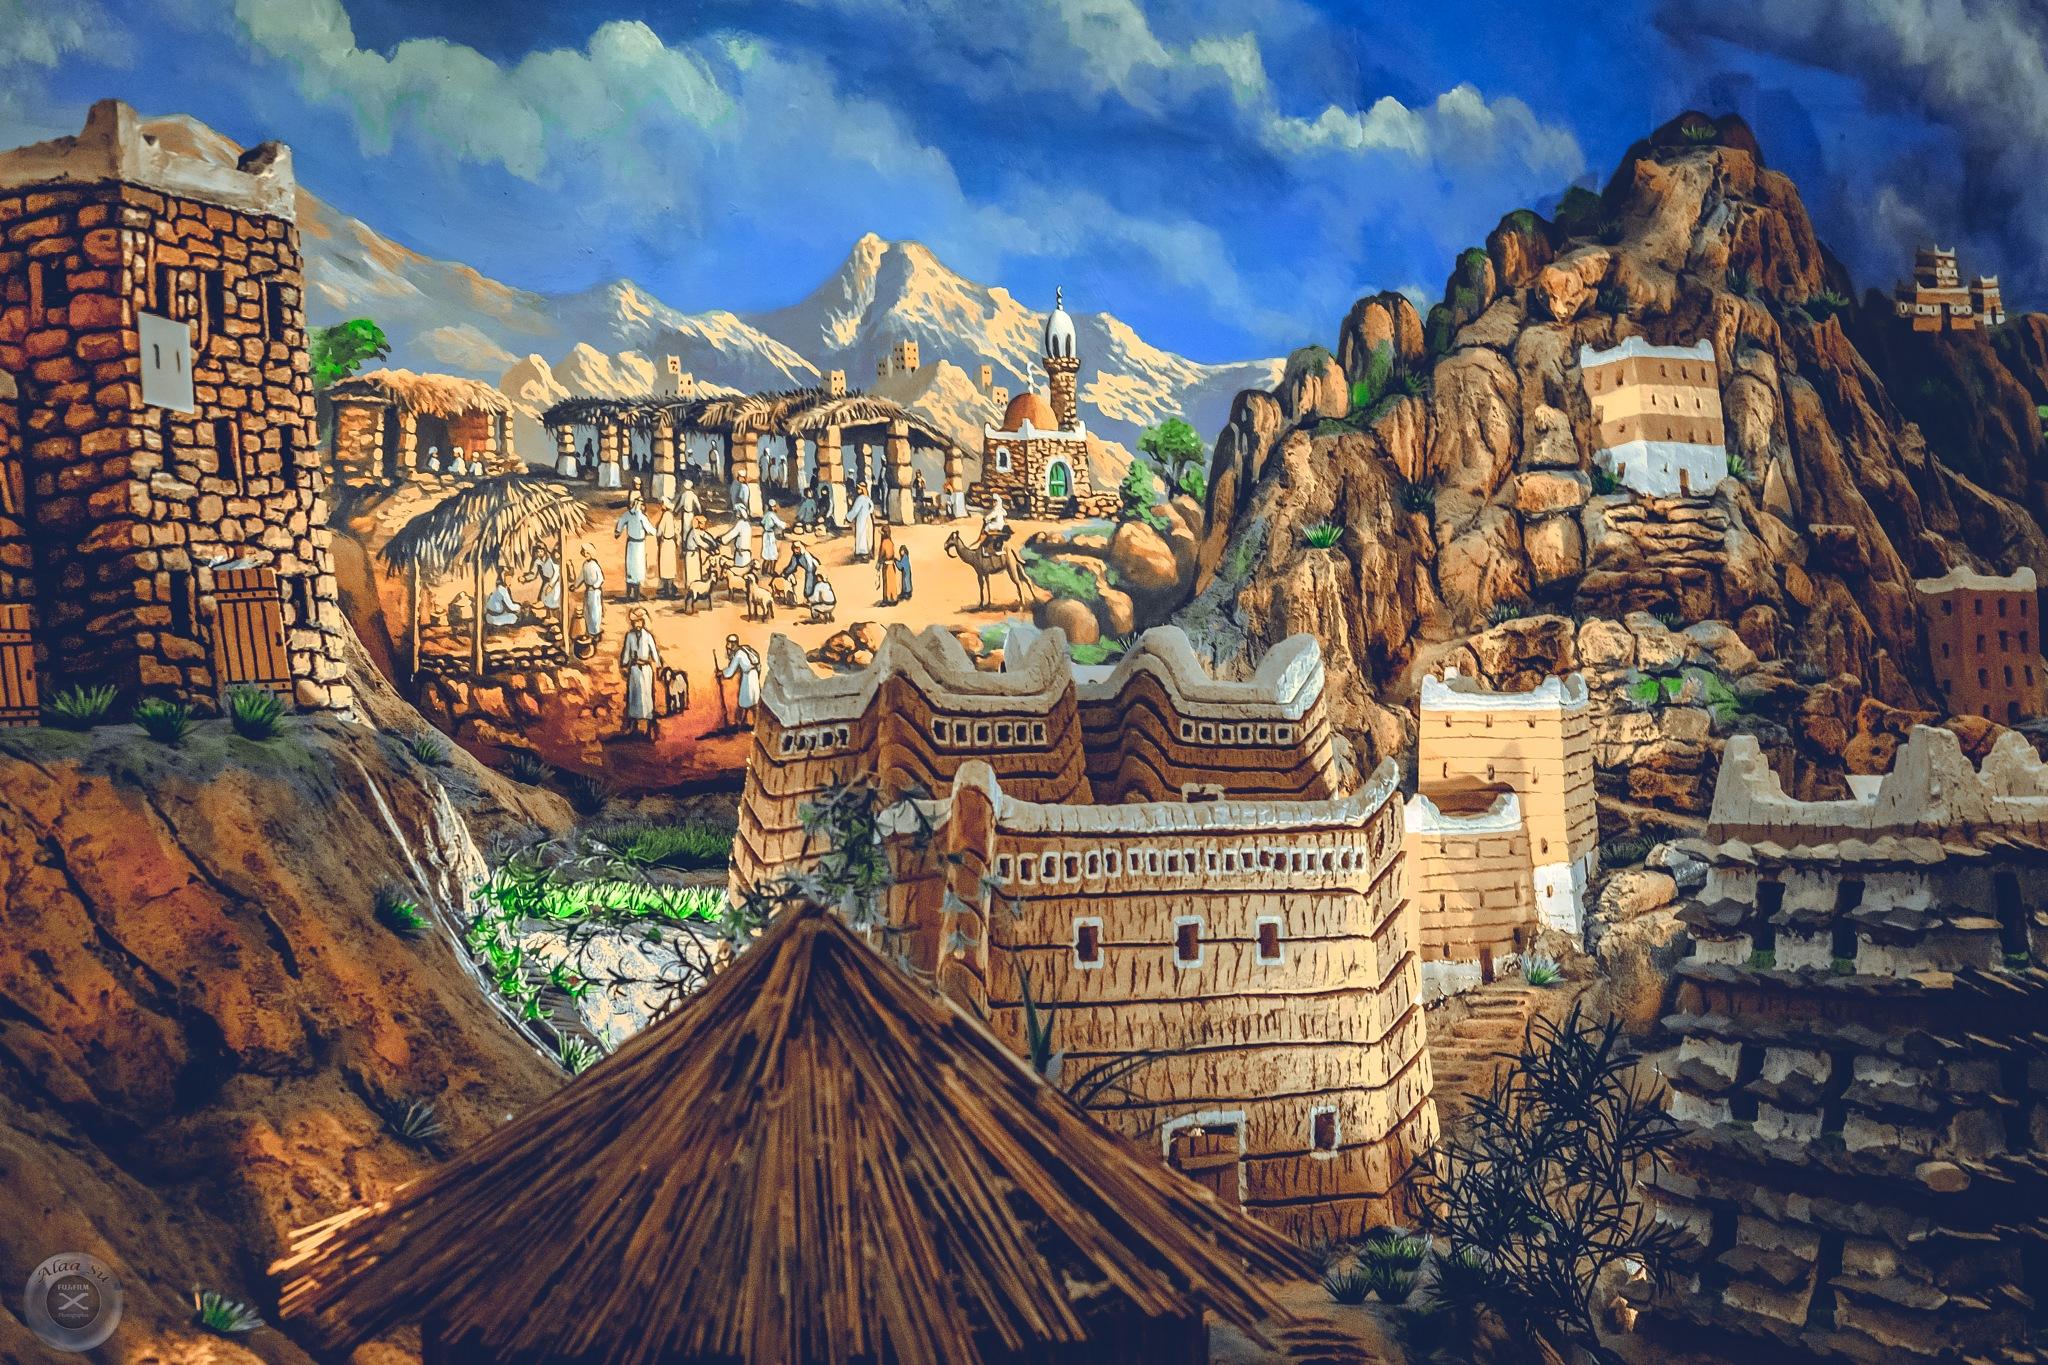 mountain village 2 - Antique  by Alaa Su